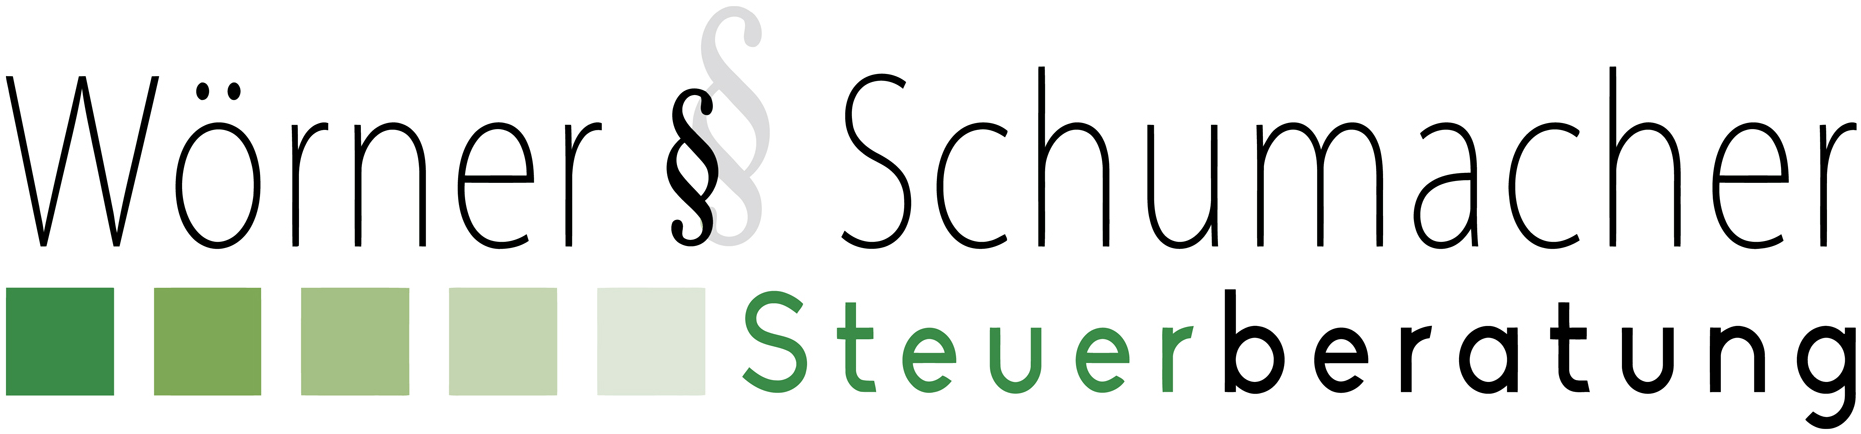 Wörner & Schumacher Steuerberatung GbR